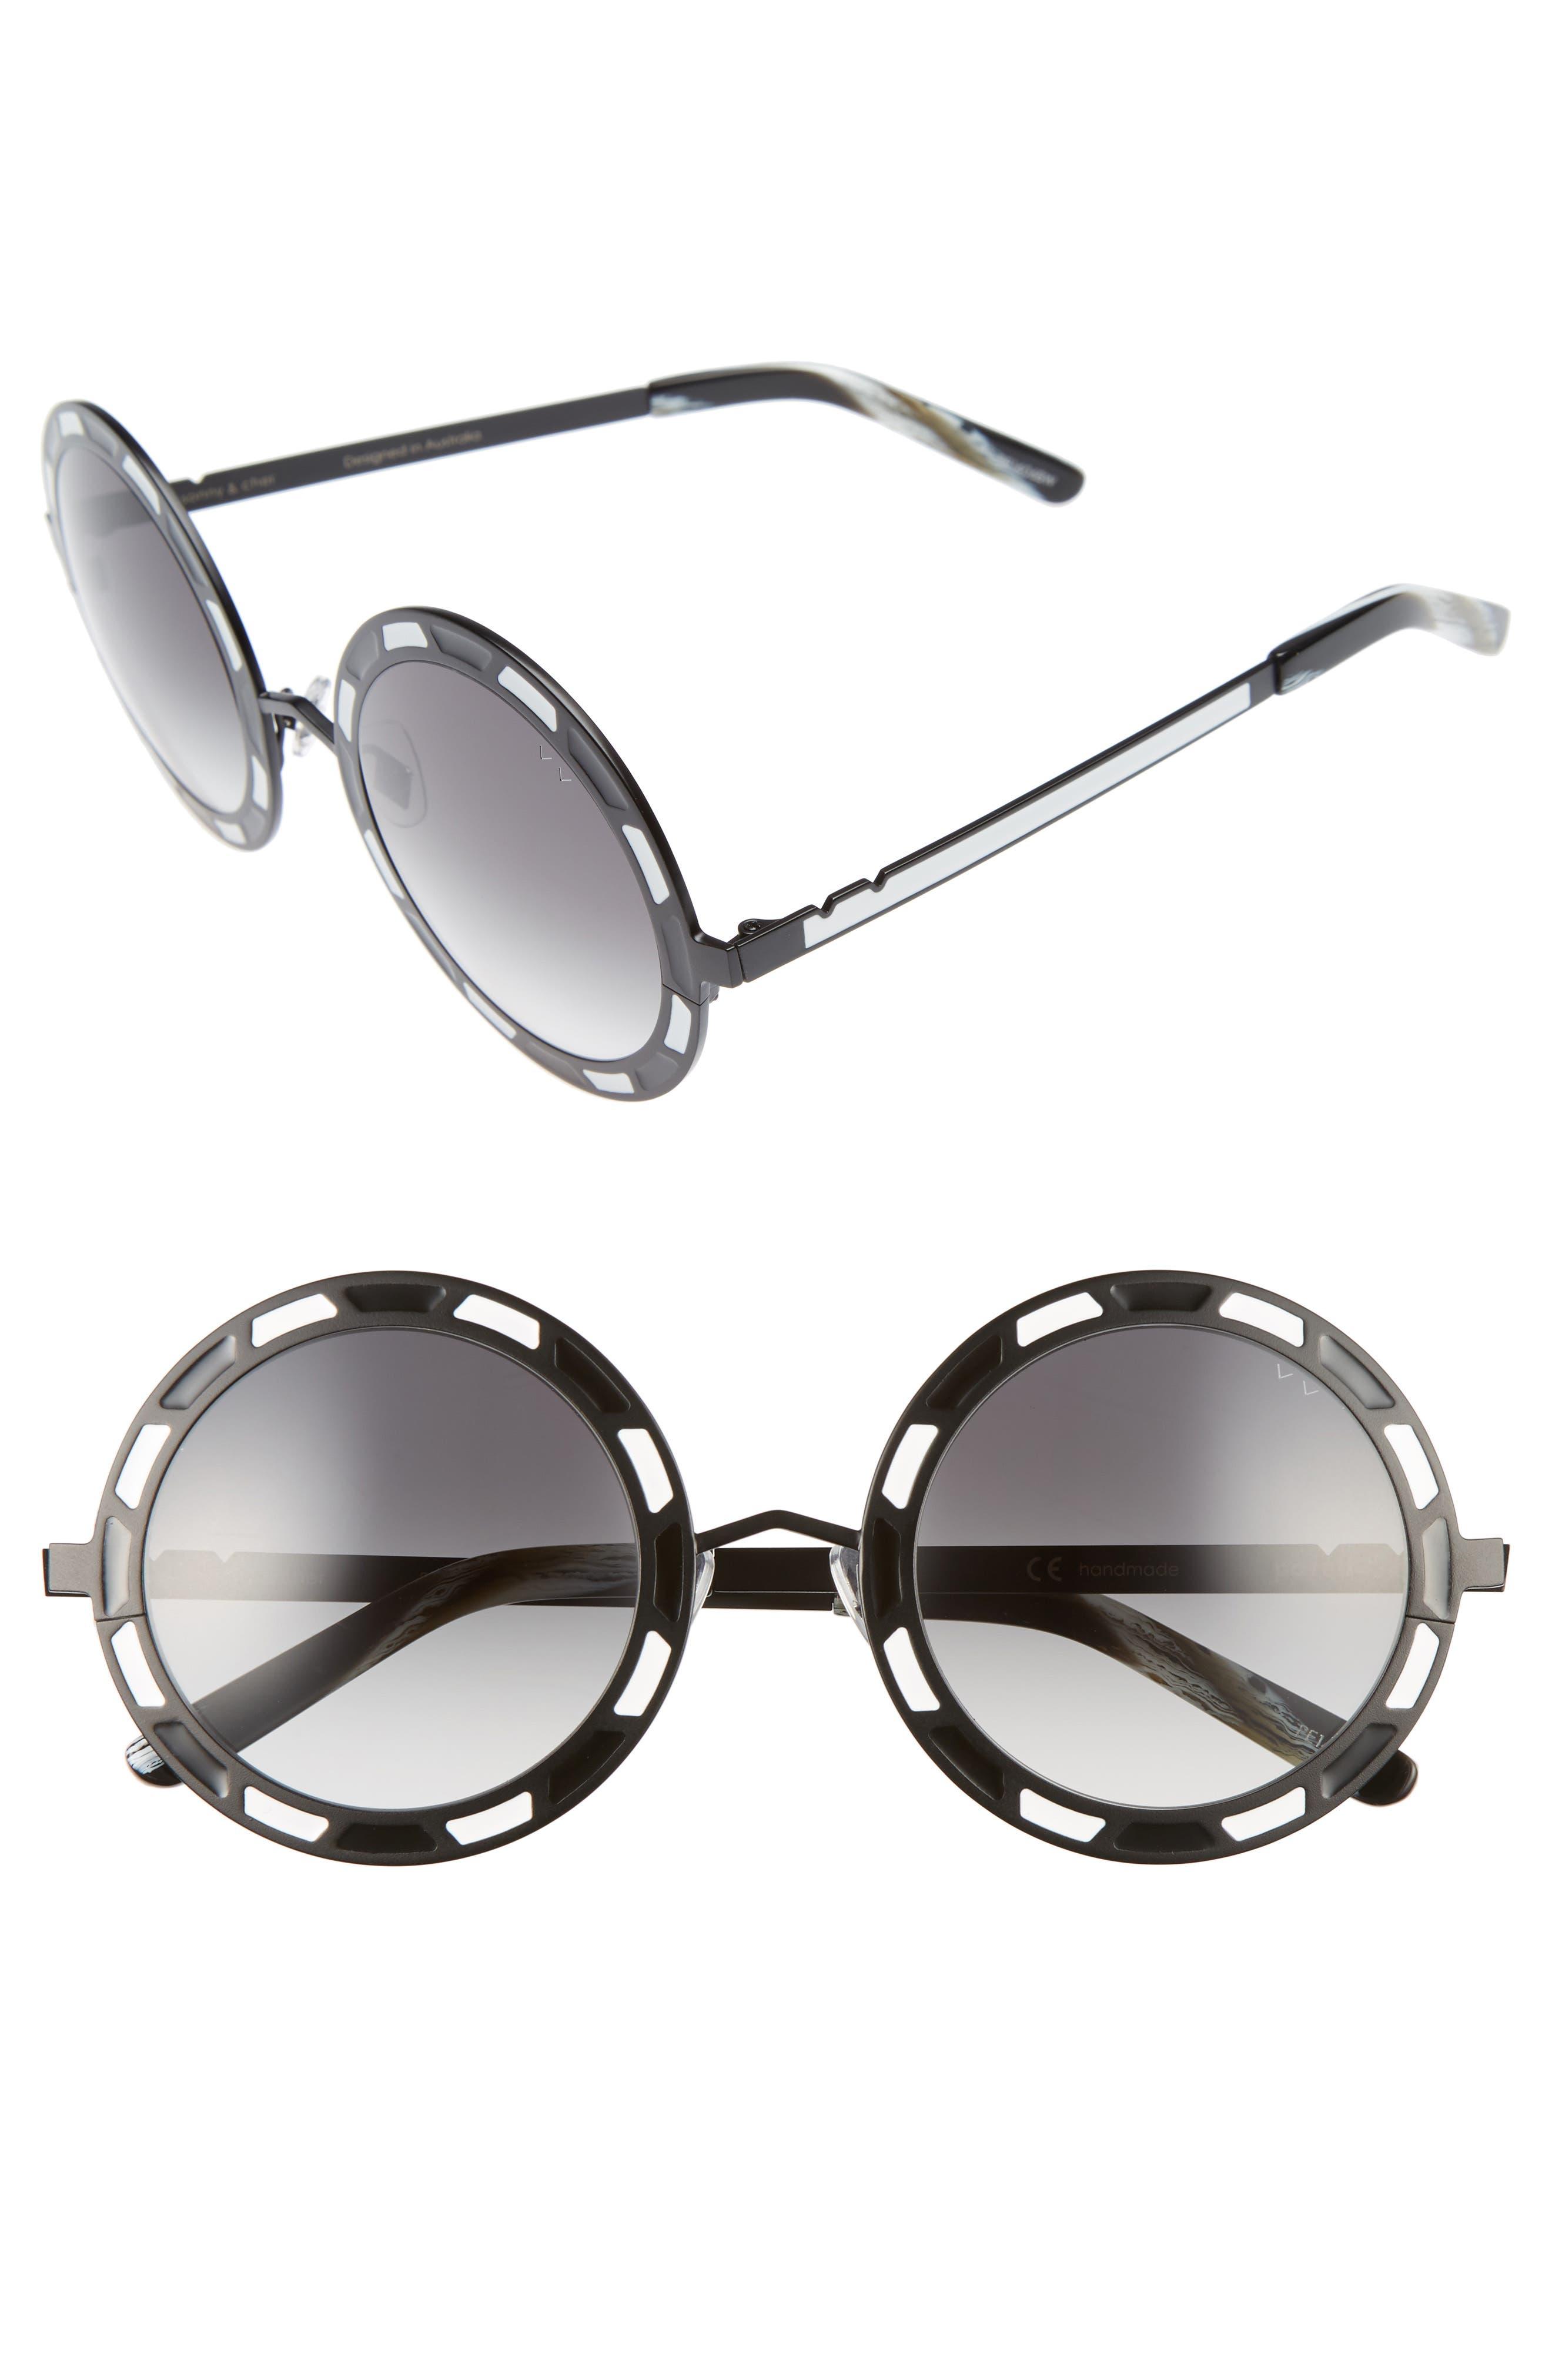 Sonny & Cher 50mm Round Sunglasses,                             Main thumbnail 1, color,                             Black Titanium/ White Grey